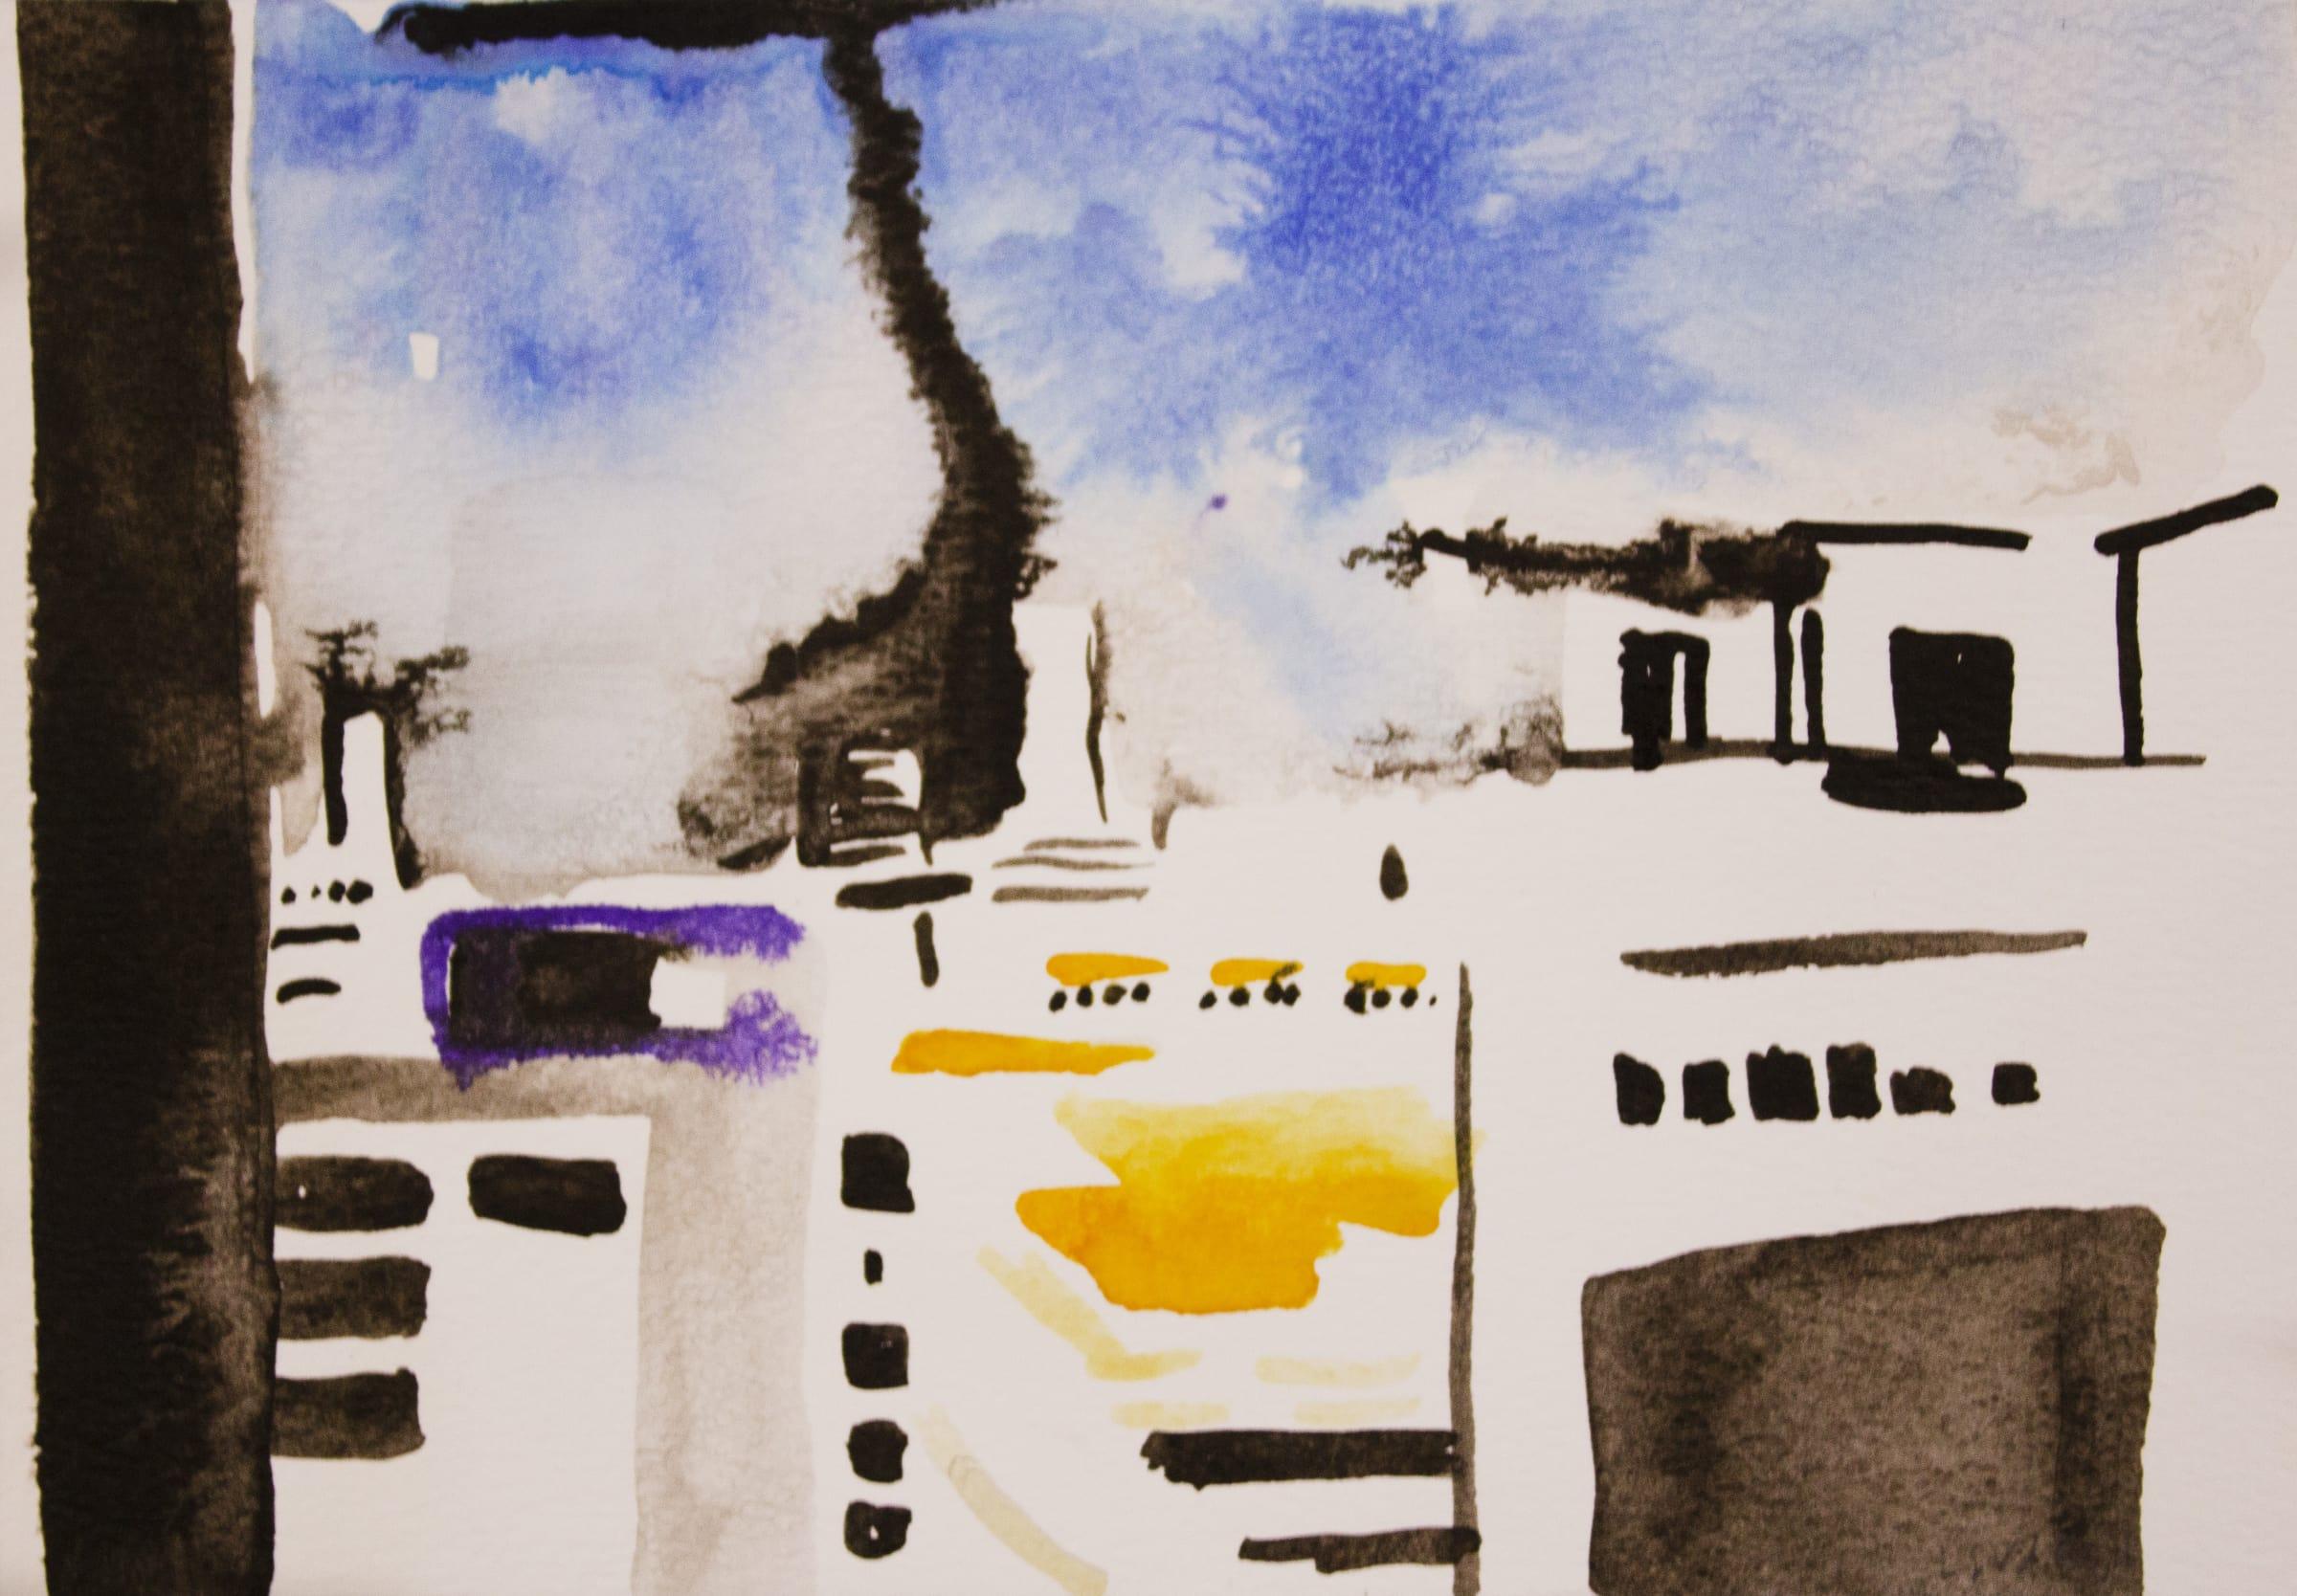 <span class=&#34;link fancybox-details-link&#34;><a href=&#34;/artists/88-louise-van-der-bijl/works/2297-louise-van-der-bijl-inktober-day-5-2018/&#34;>View Detail Page</a></span><div class=&#34;artist&#34;><strong>Louise Van Der Bijl</strong></div> <div class=&#34;title&#34;><em>Inktober Day 5</em>, 2018</div> <div class=&#34;medium&#34;>Ink On Paper</div> <div class=&#34;dimensions&#34;>15cm x 21.2cm</div><div class=&#34;price&#34;>R400.00</div>